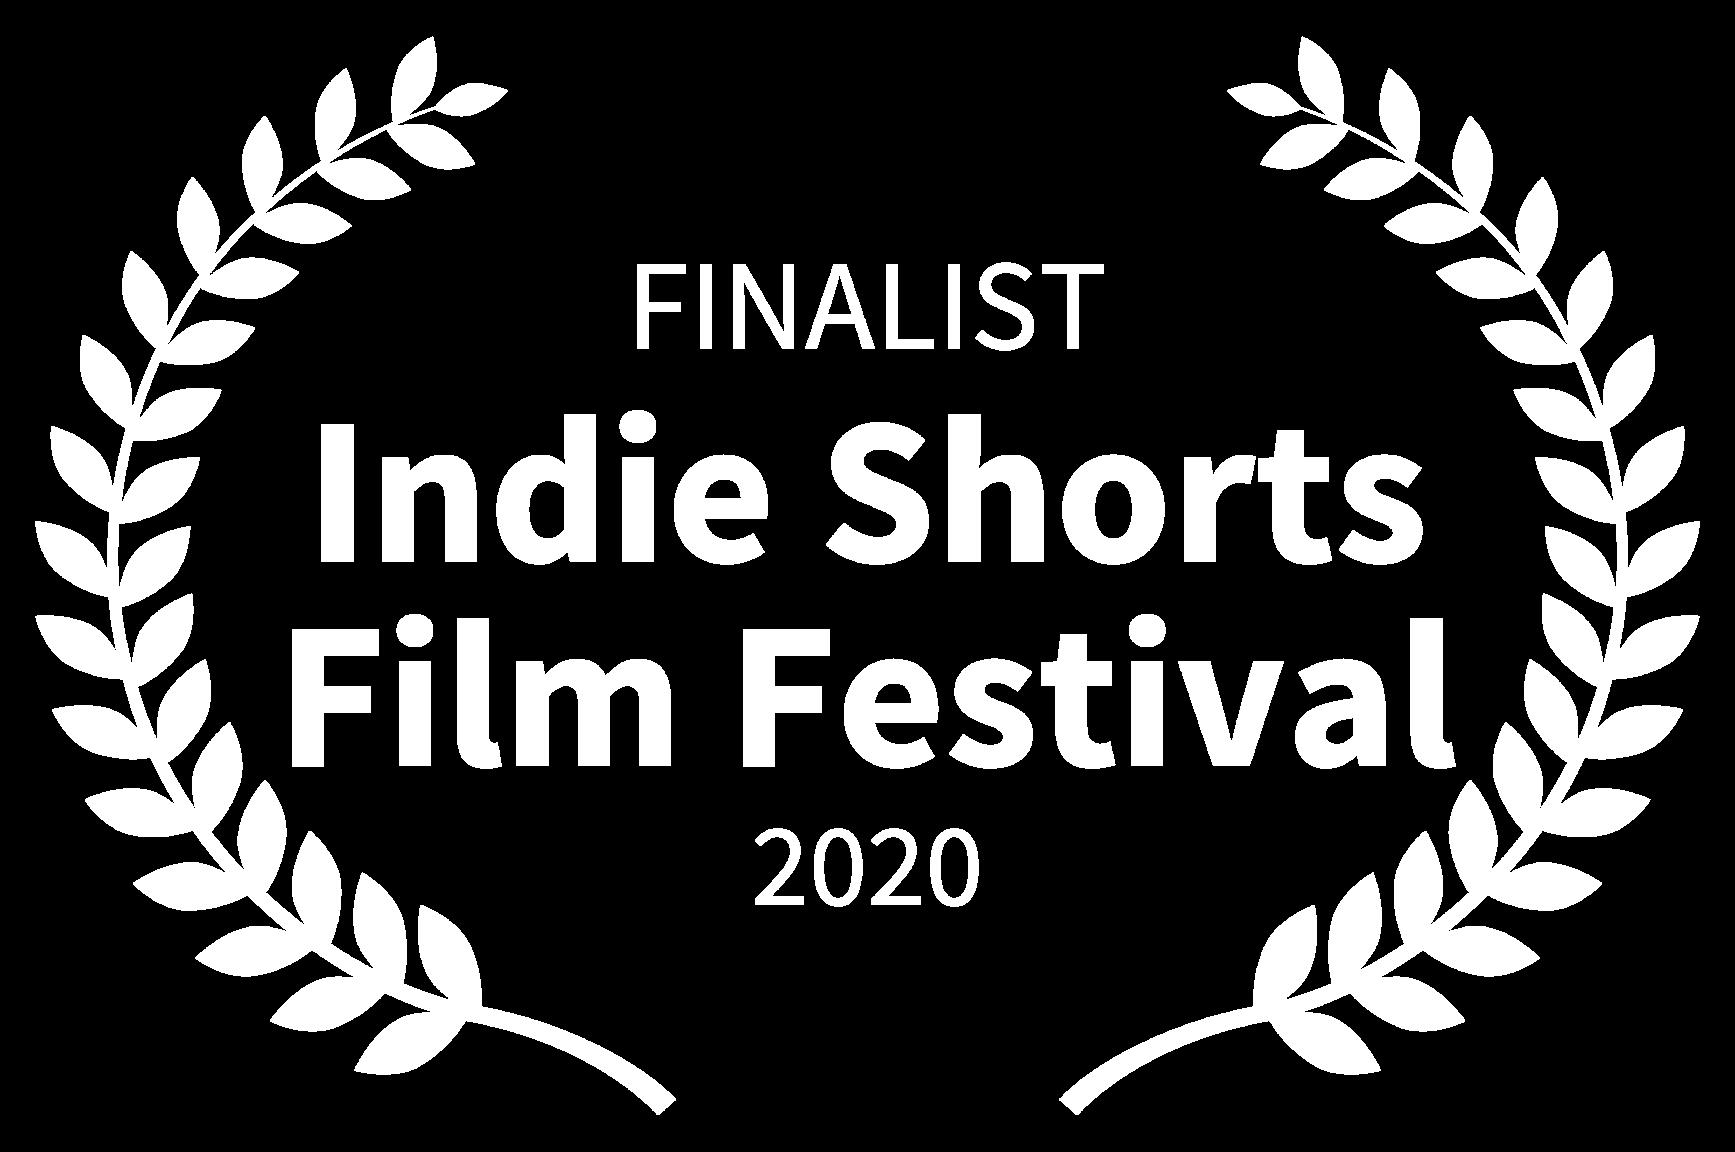 FINALIST - Indie Shorts Film Festival - 2020